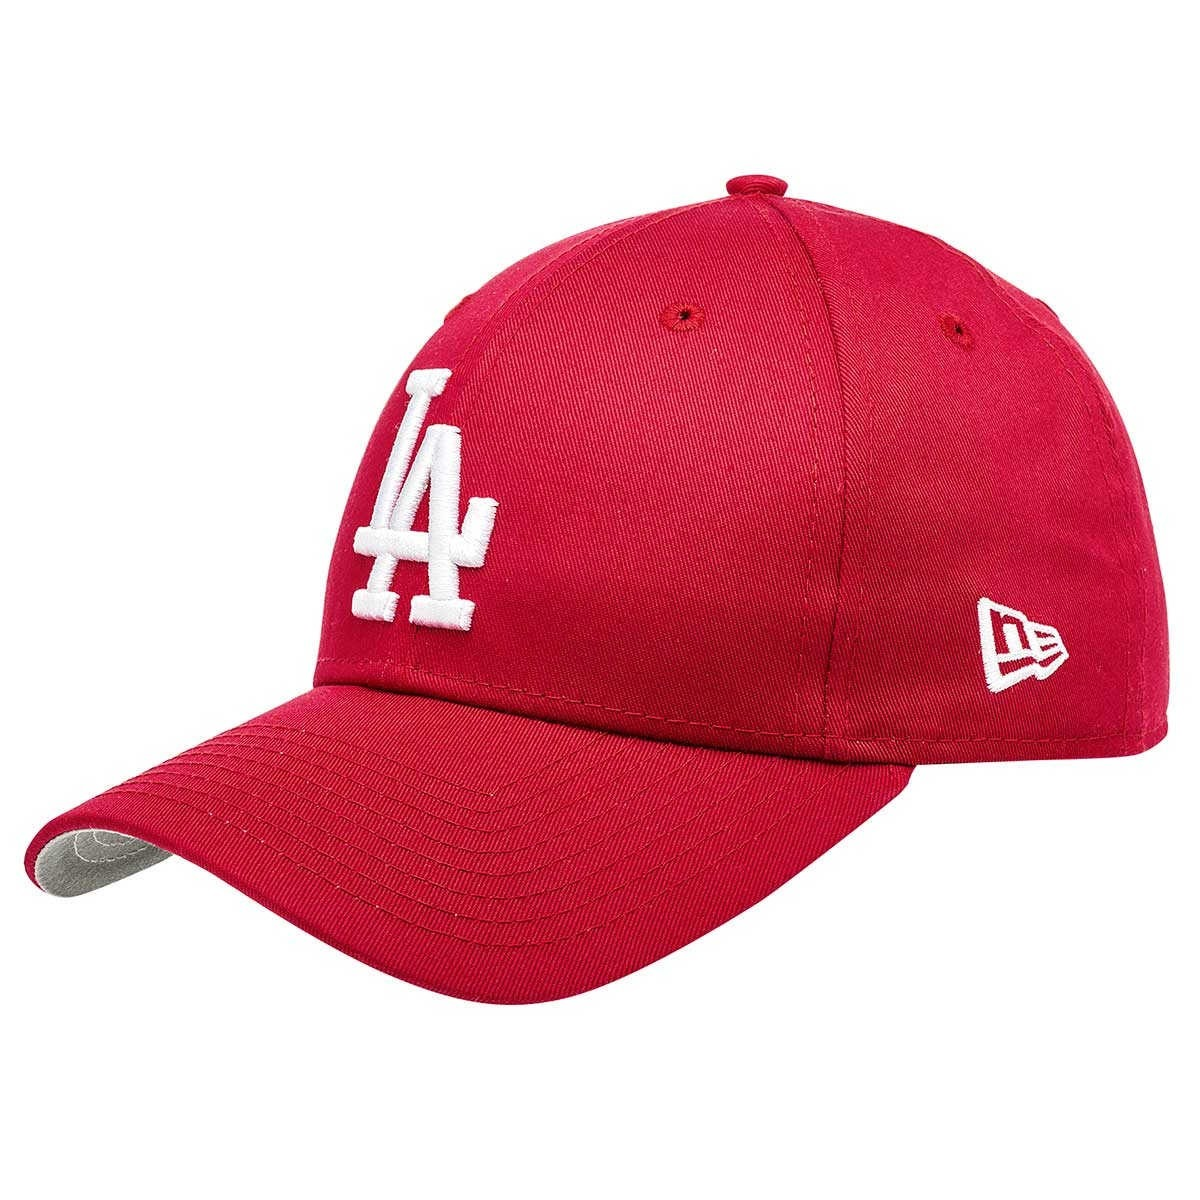 e81b97b57799 Gorra Beisbol Angeles Roj New Era 11177081 Unitalla 82865 T2